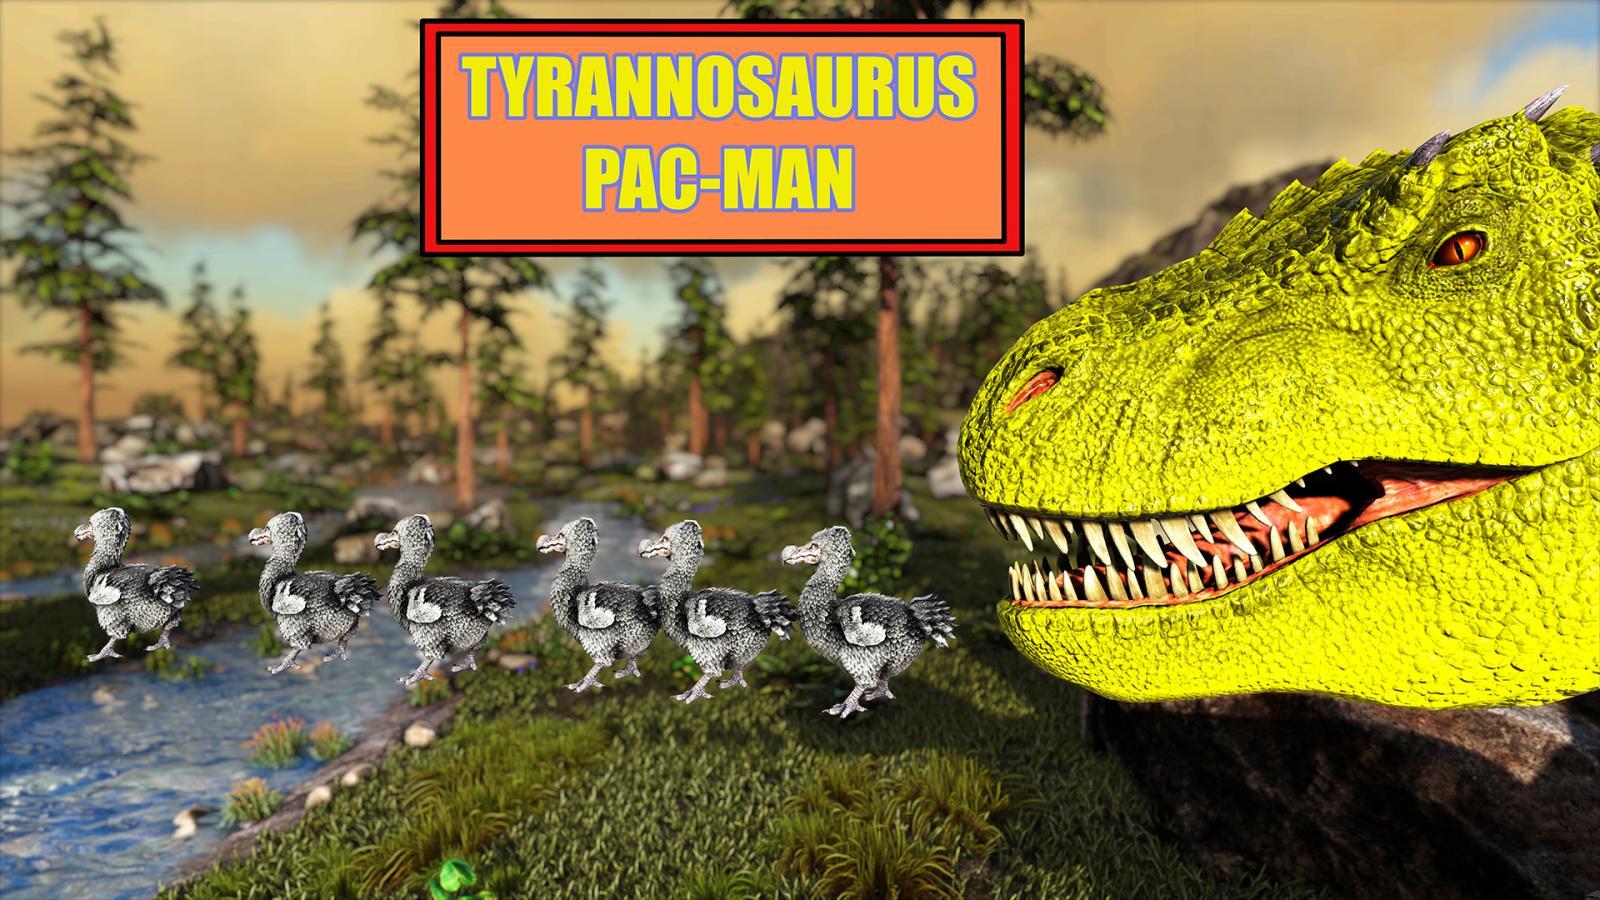 large.5a9d842a77f59_WolfAmaterasu-TyrannosaurusPac-Man-Freeform.jpg